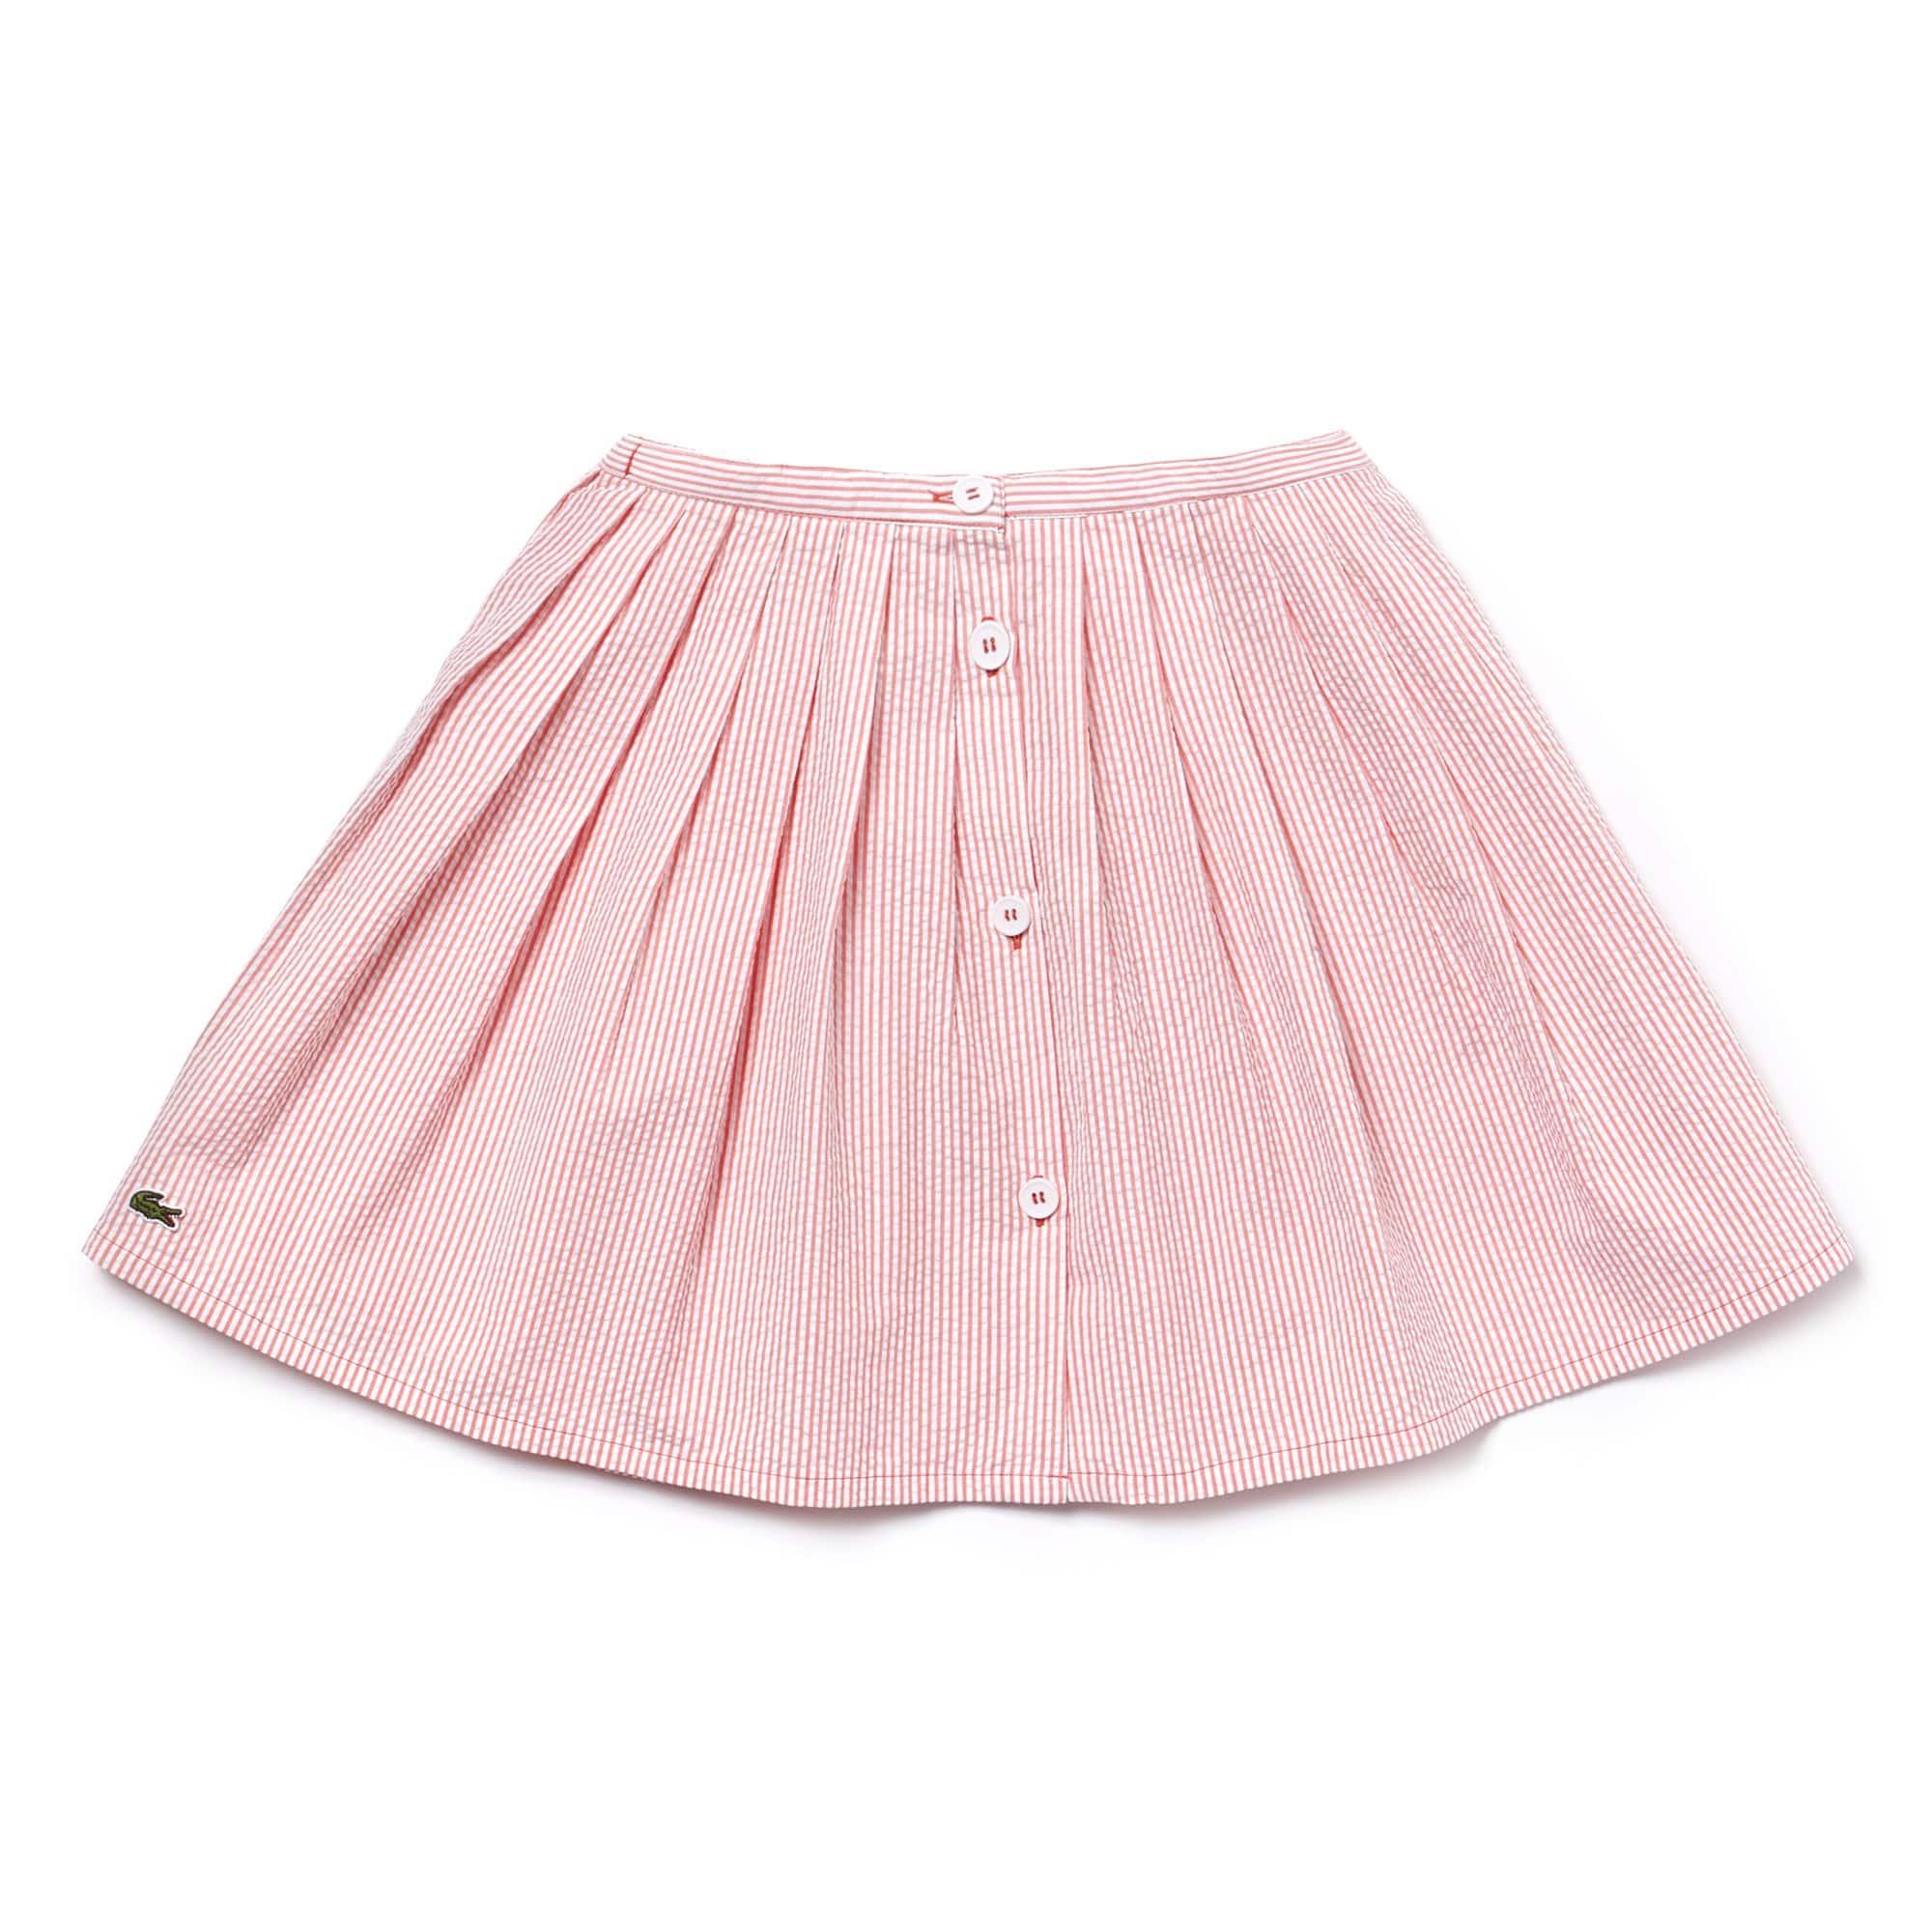 Girls' Cotton Seersucker Pleated Skirt